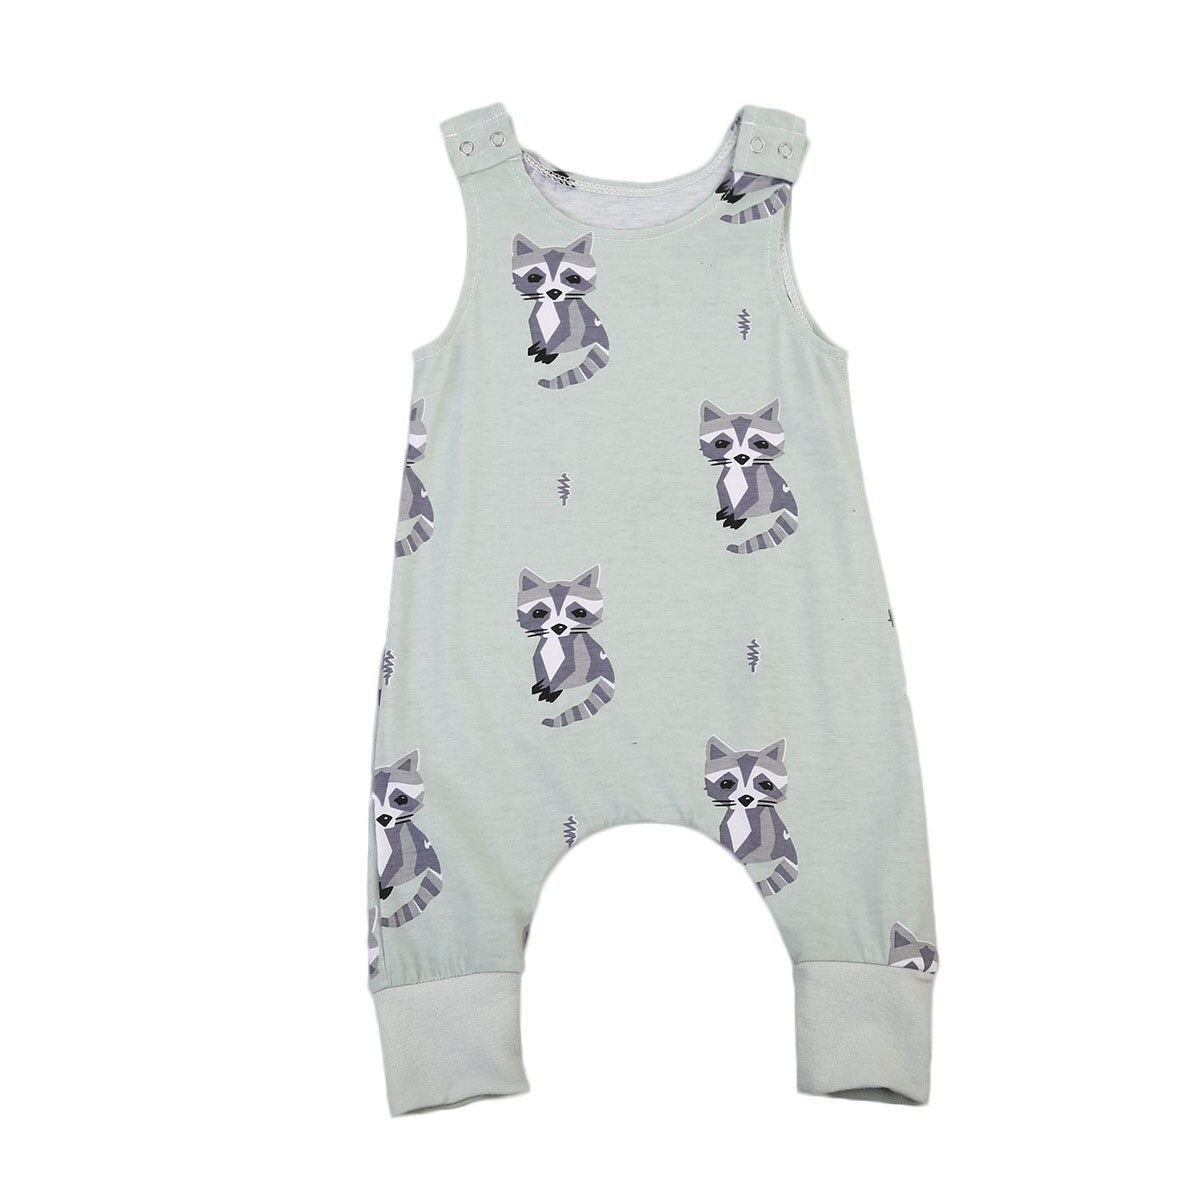 Ropa de 0 a 24M para recién nacidos, pelele sin mangas, mono, ropa de bebé, pelele